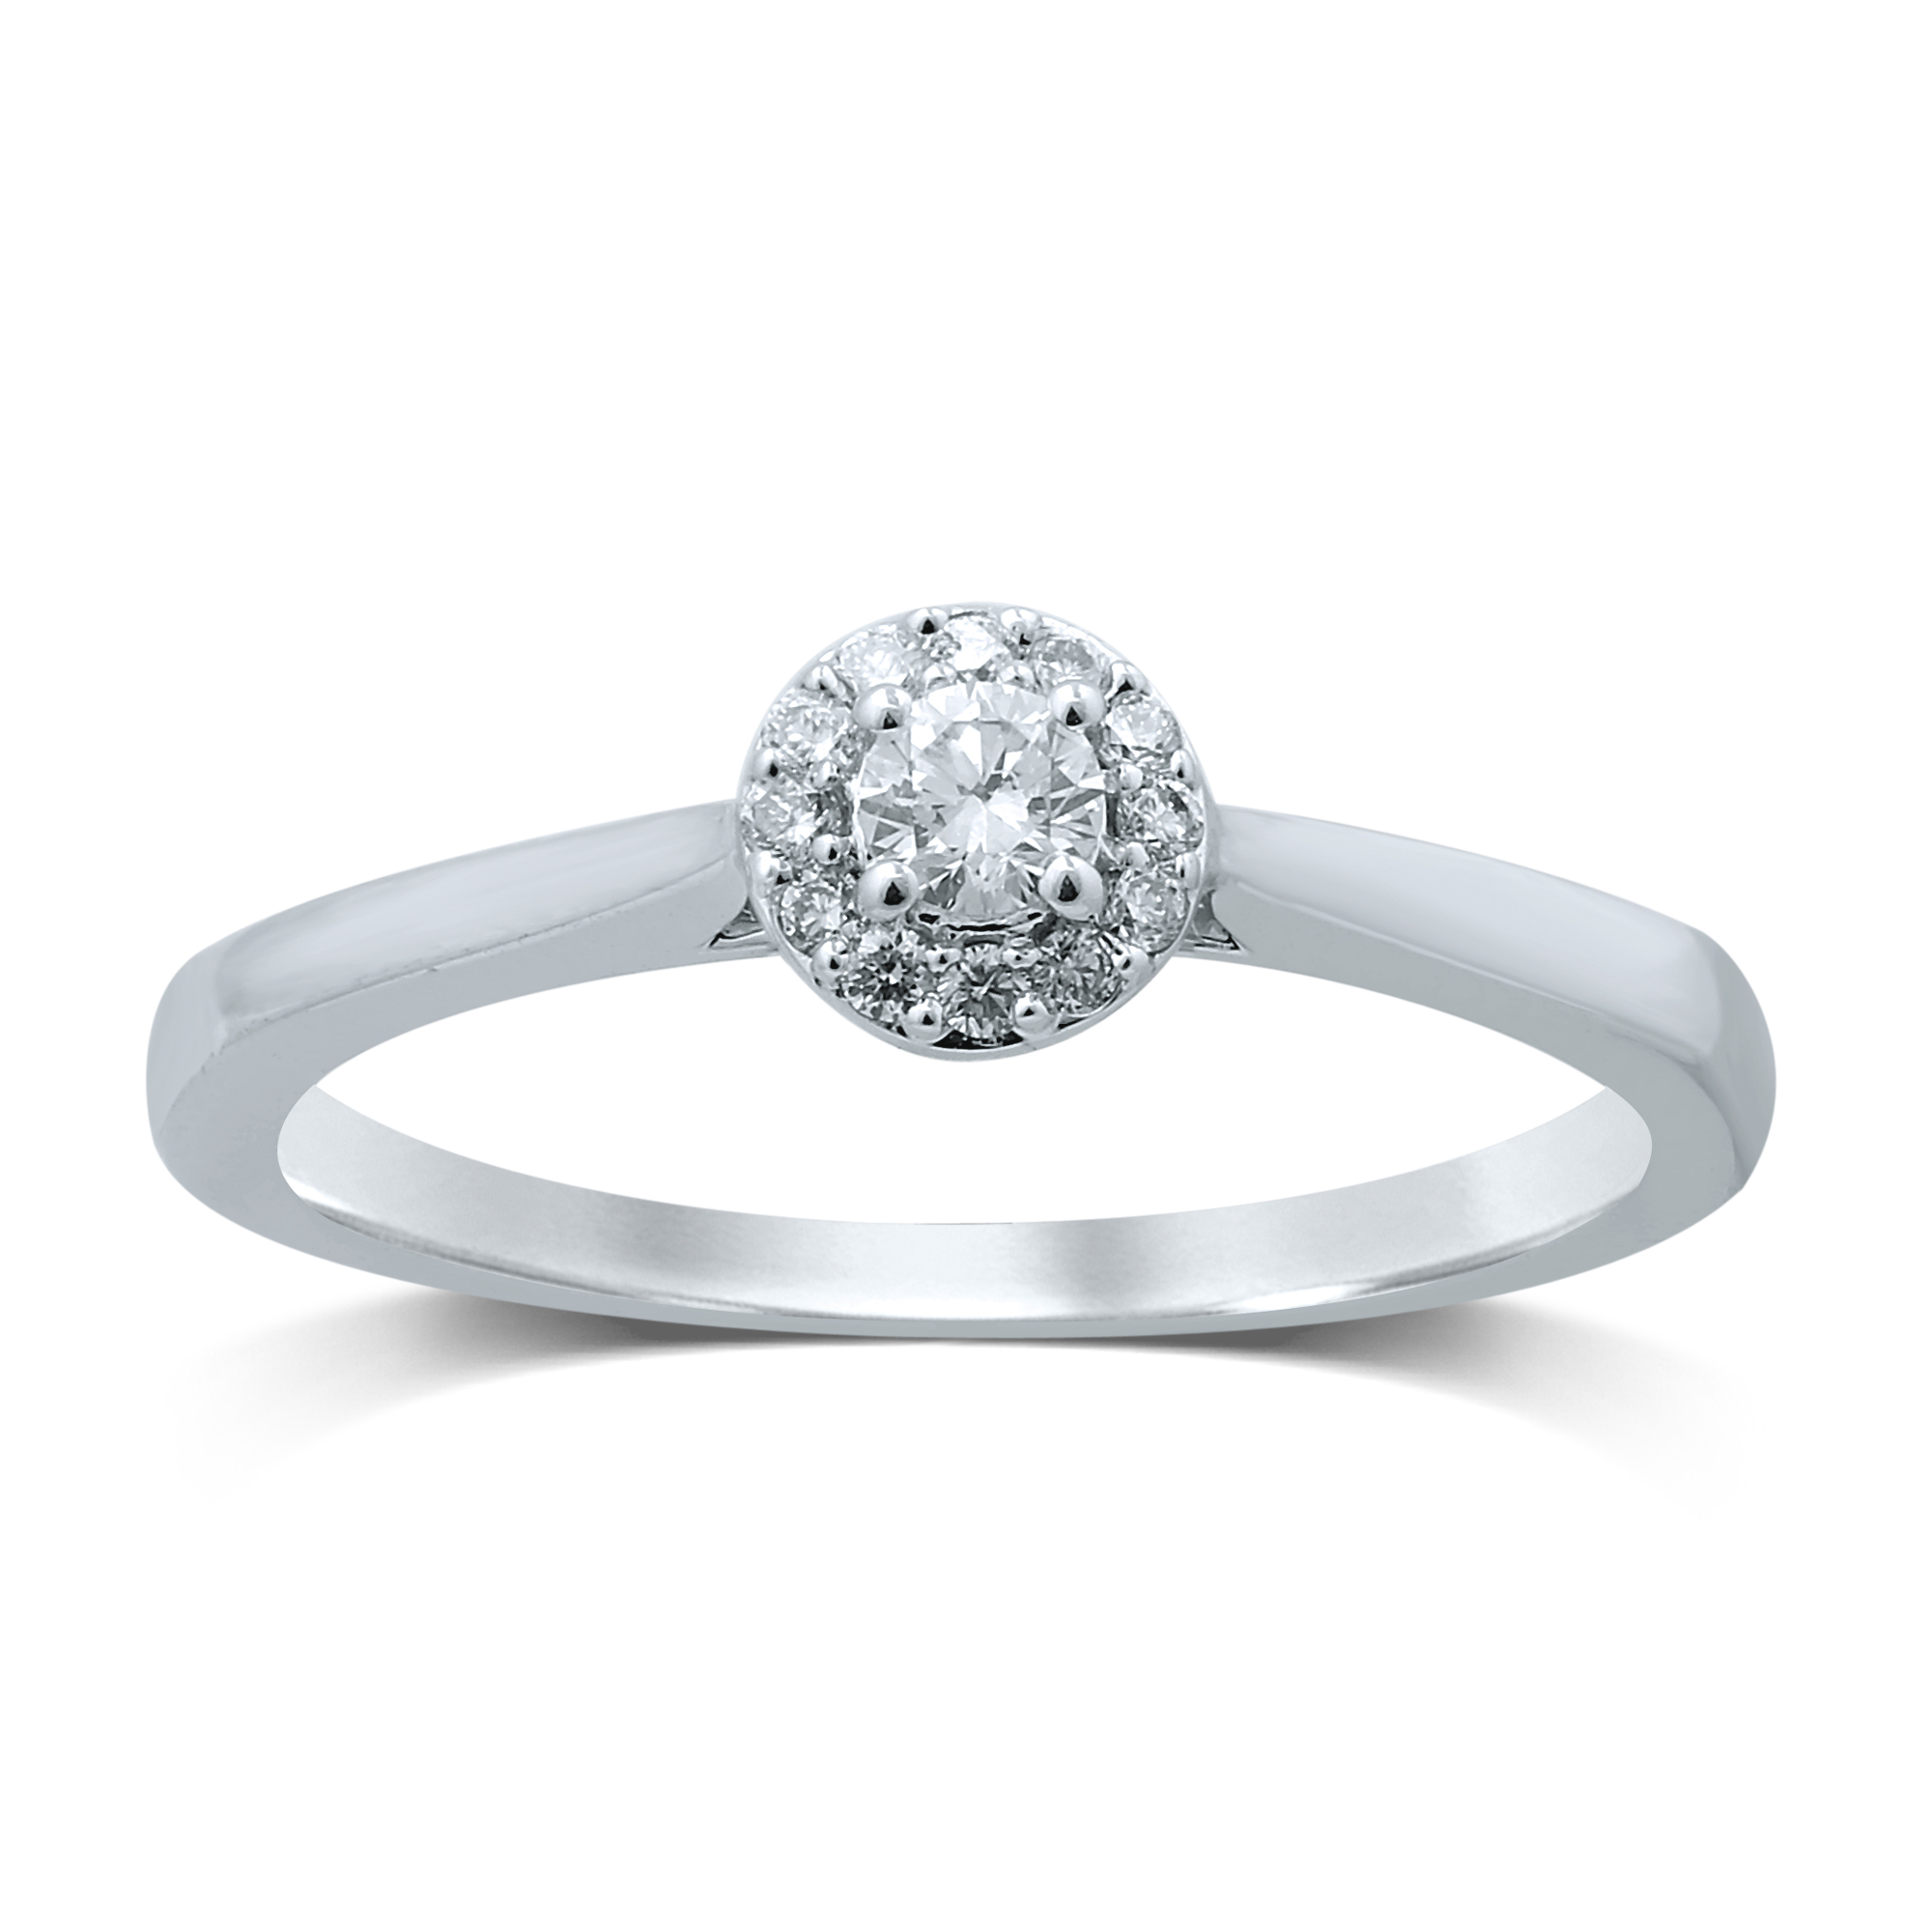 Luminesce Lab Grown 18ct White Gold 0.15 Carat Diamond Halo Ring